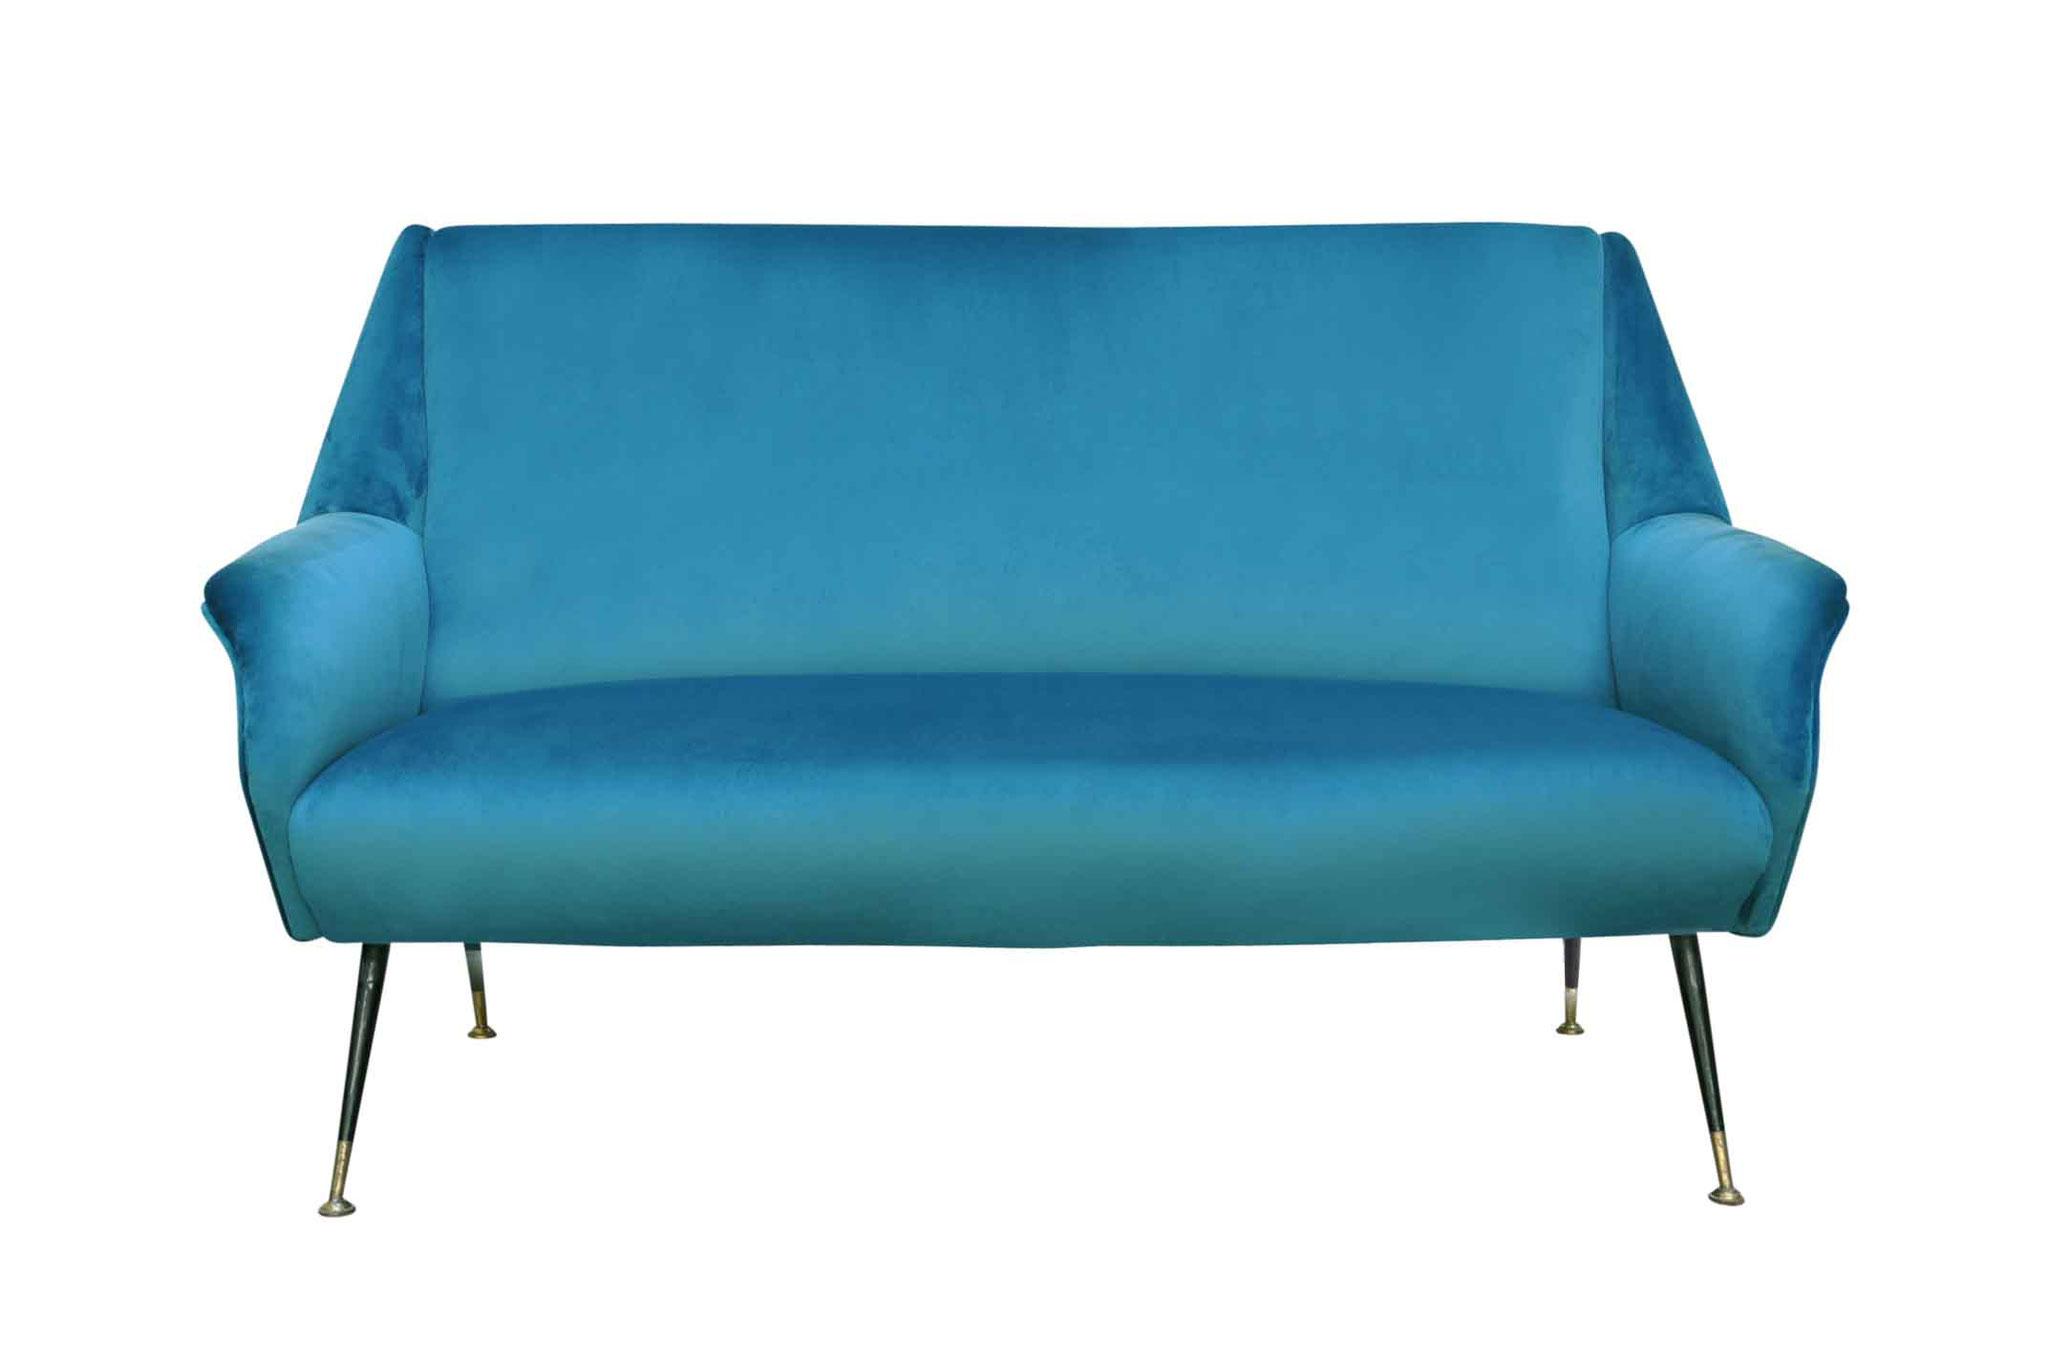 mid century modern sofa 1950s